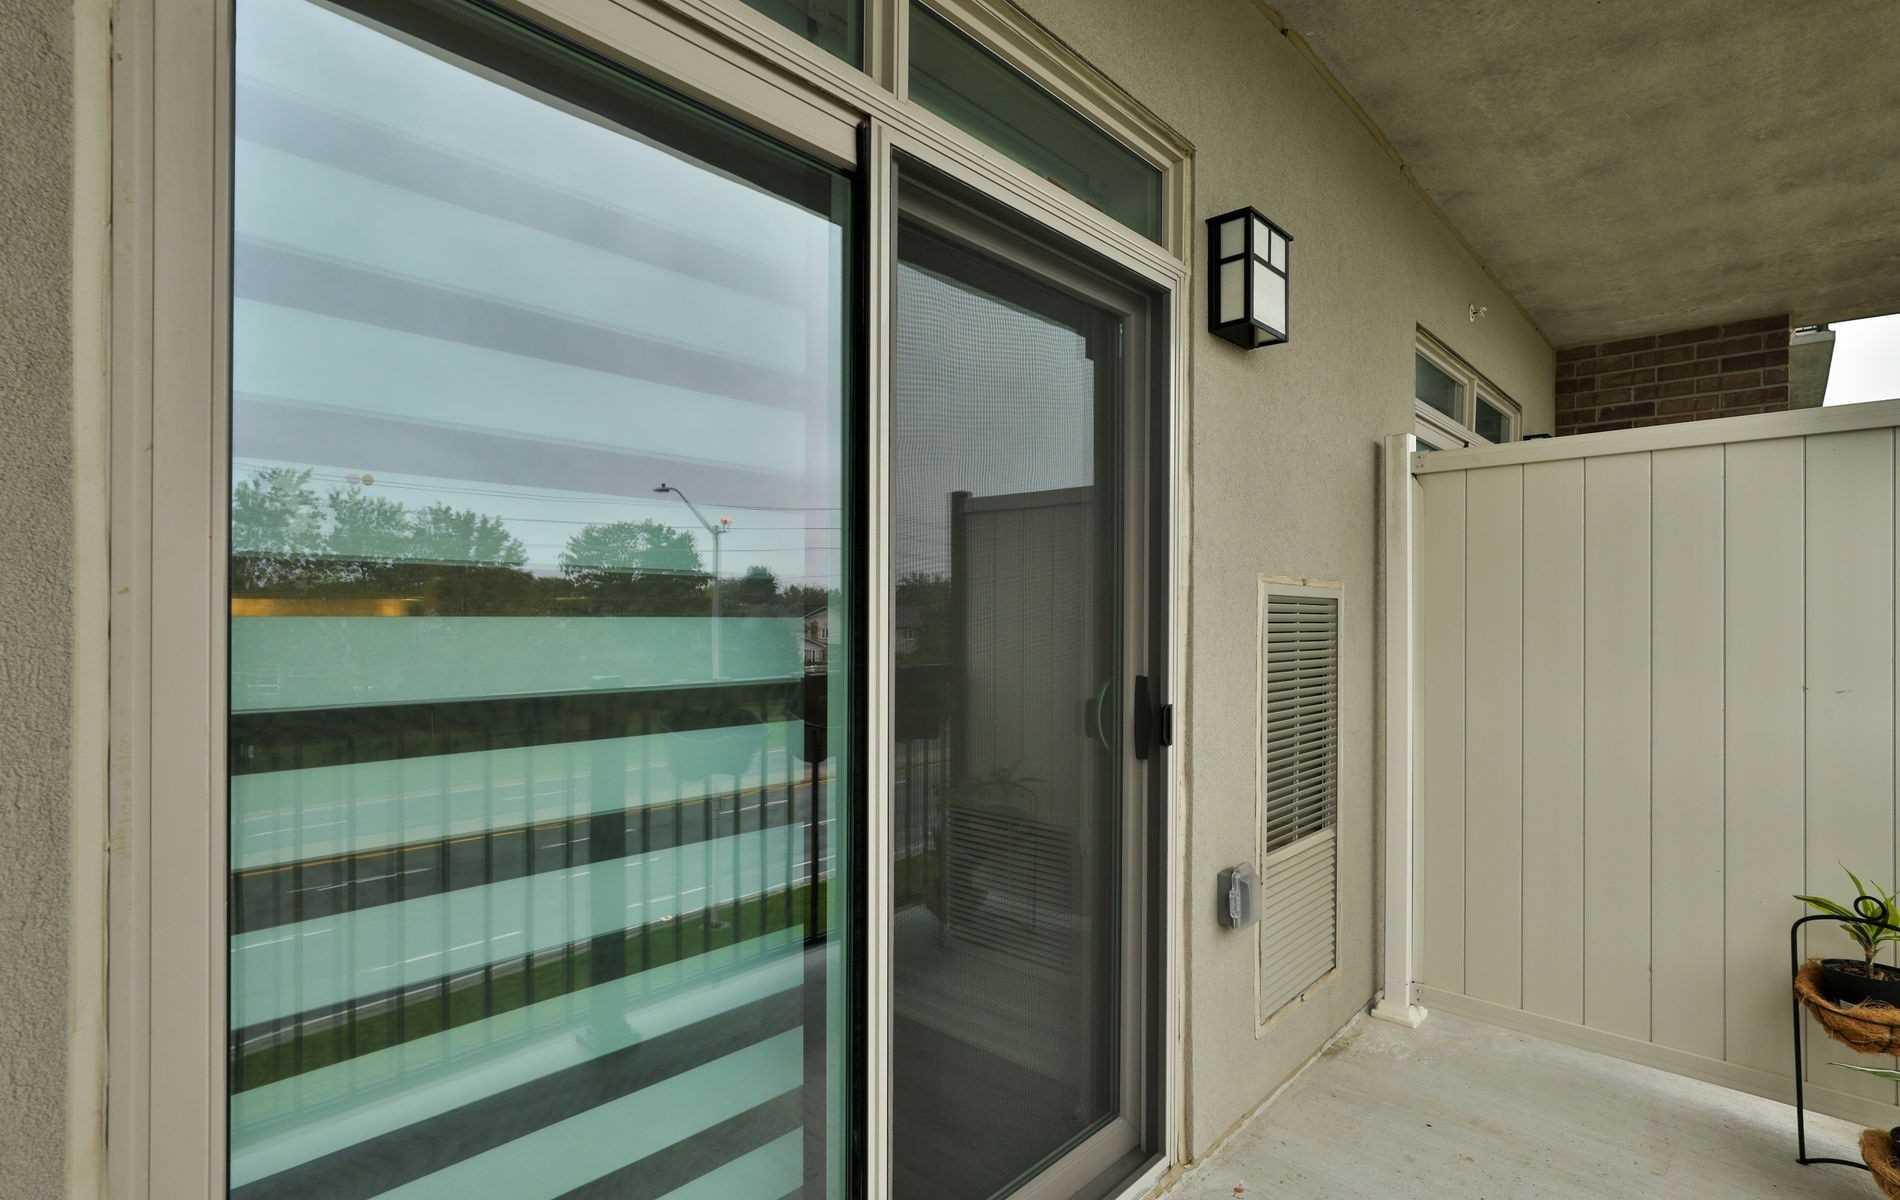 316 - 610 Farmstead Dr - Willmont Condo Apt for sale, 2 Bedrooms (W5399854) - #9